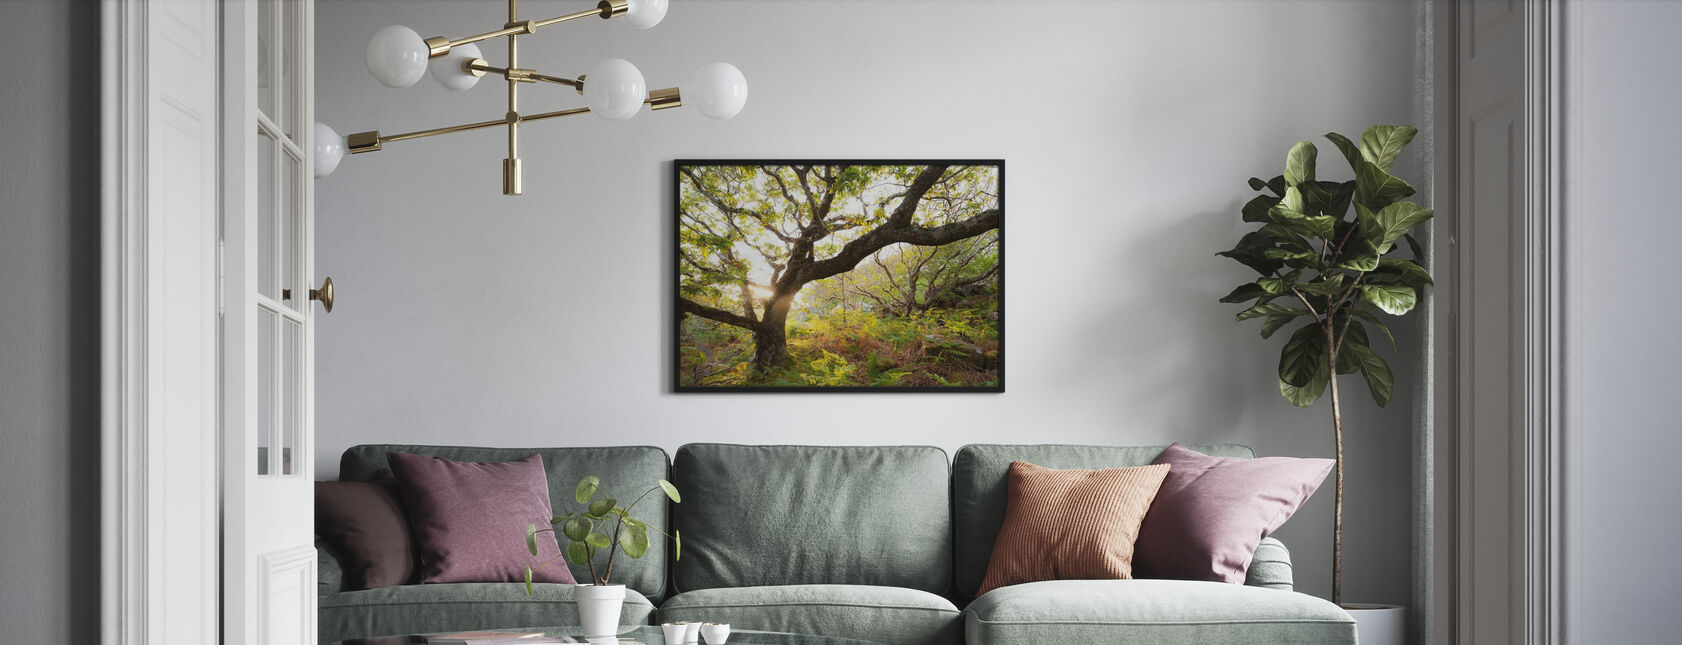 Schots eikenhout met achtergrondverlichting - Ingelijste print - Woonkamer